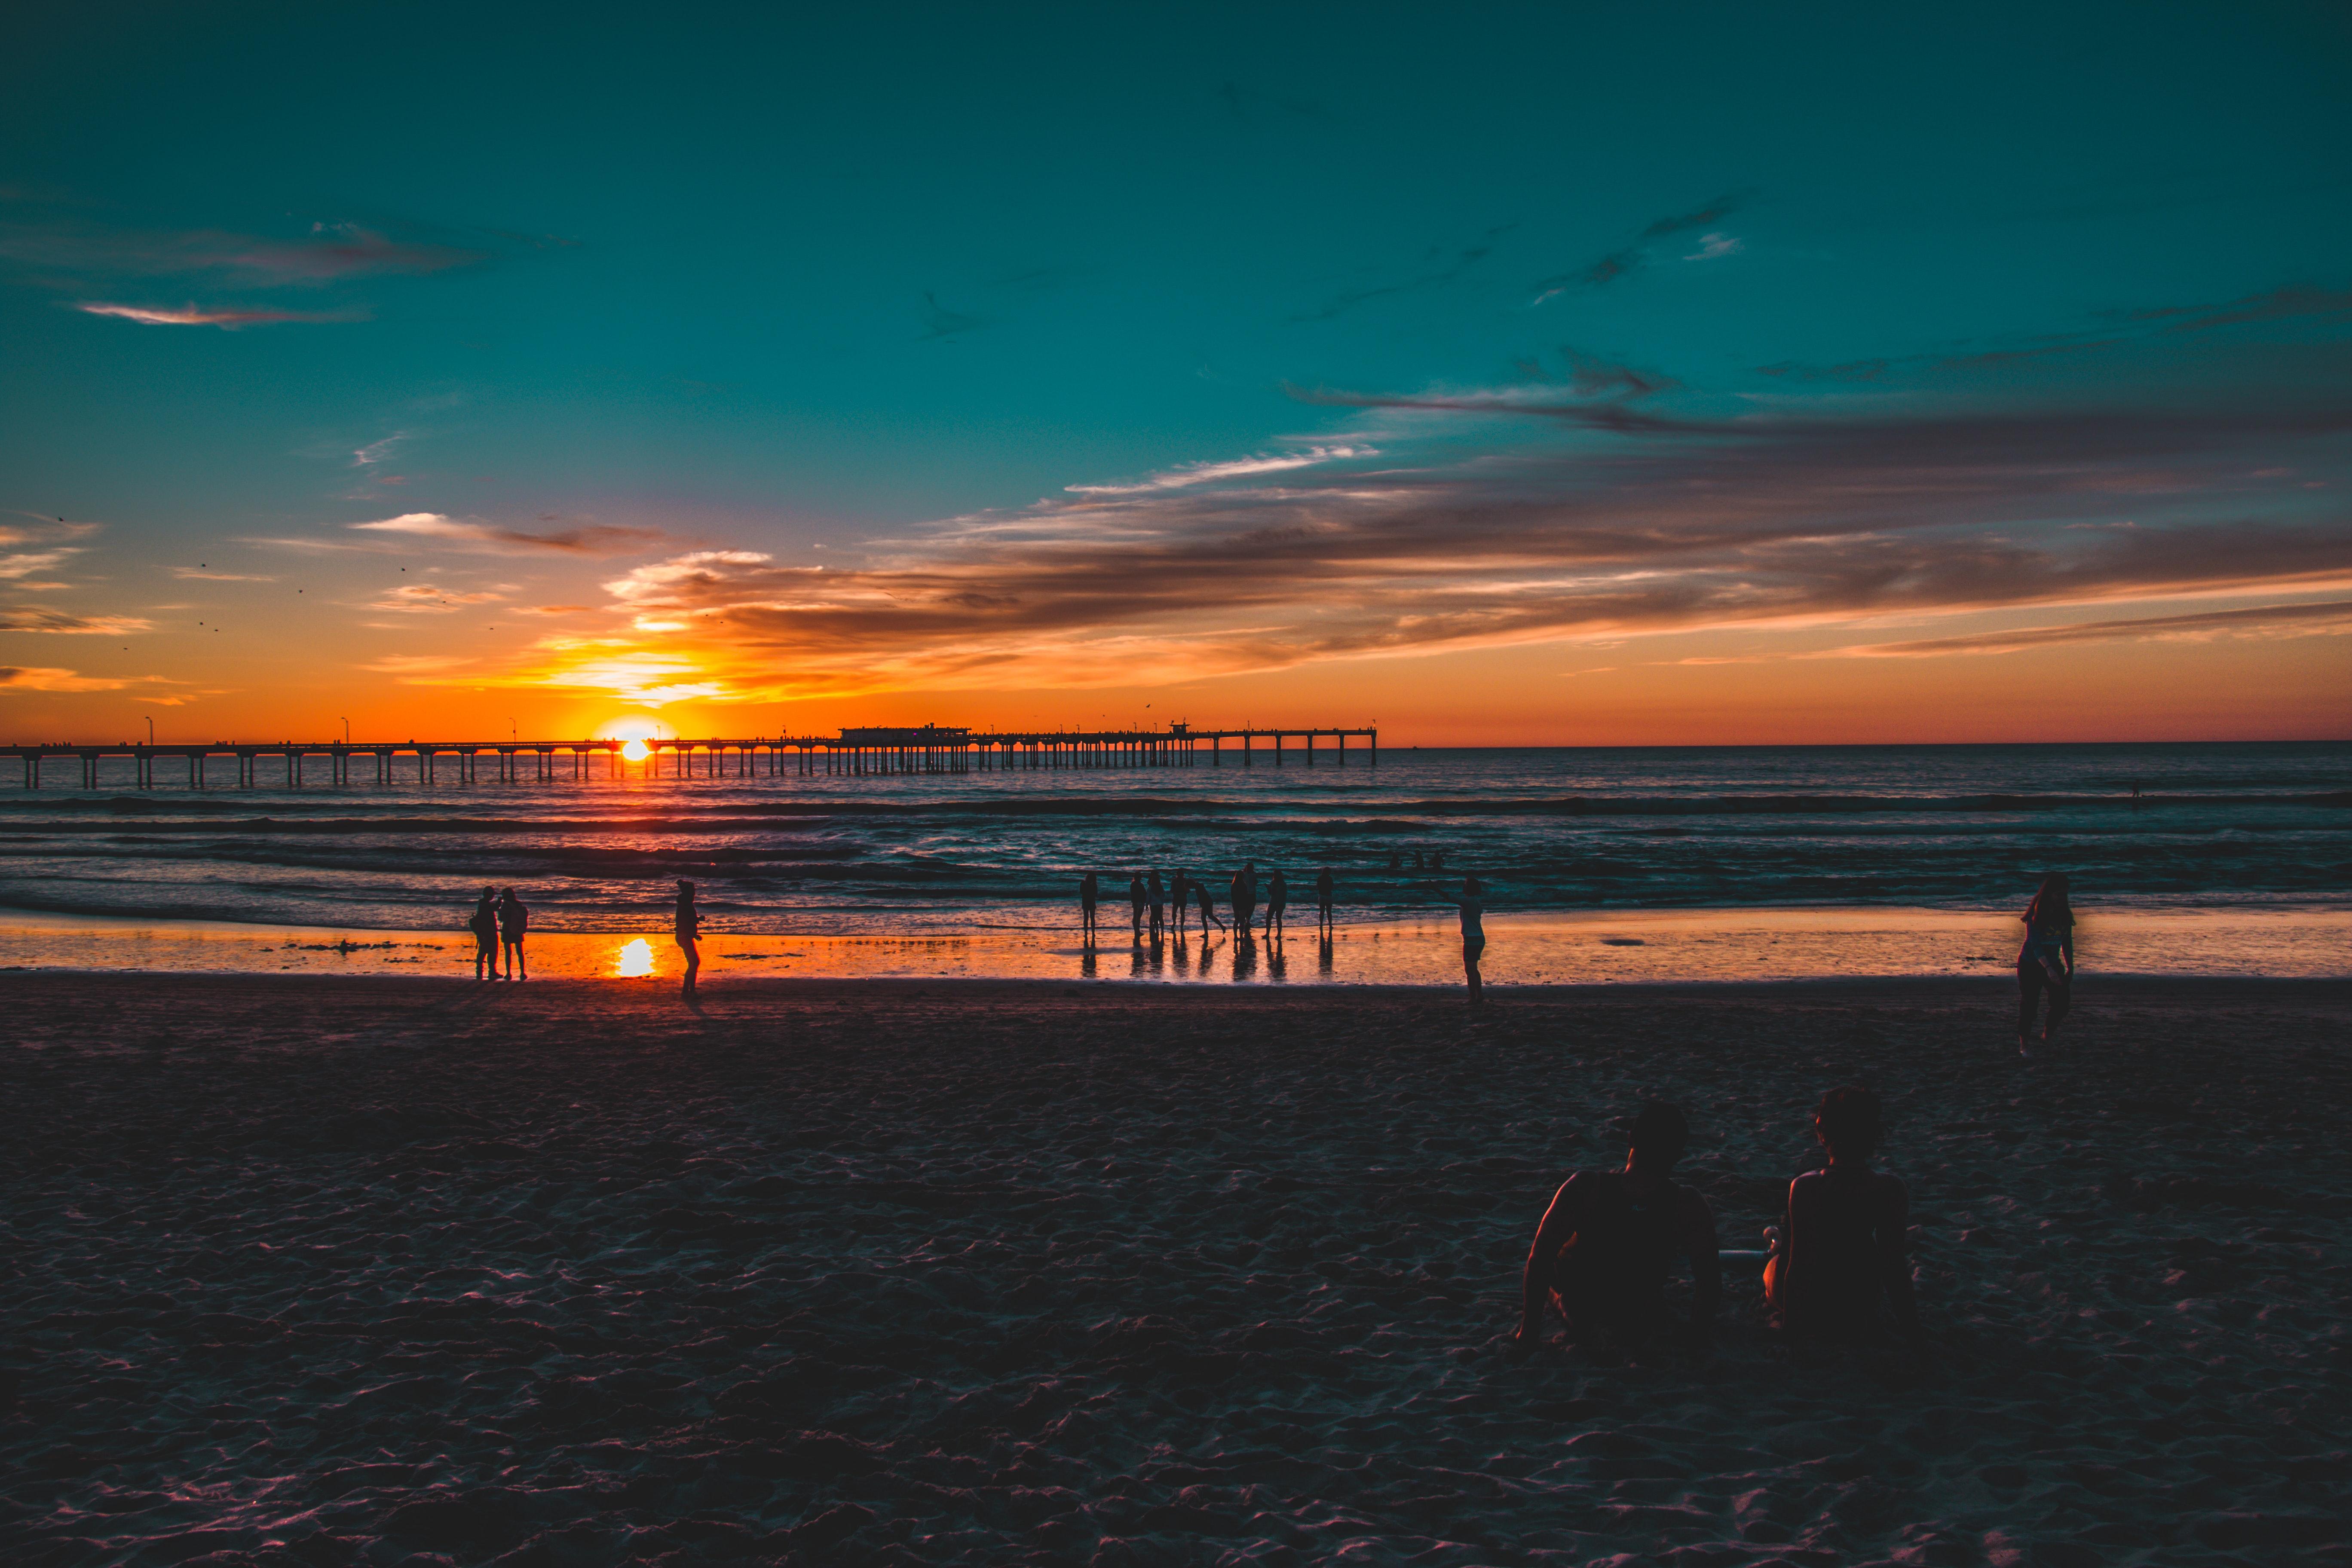 Beach at Sunset, Bay, Reflection, Travel, Sunset, HQ Photo